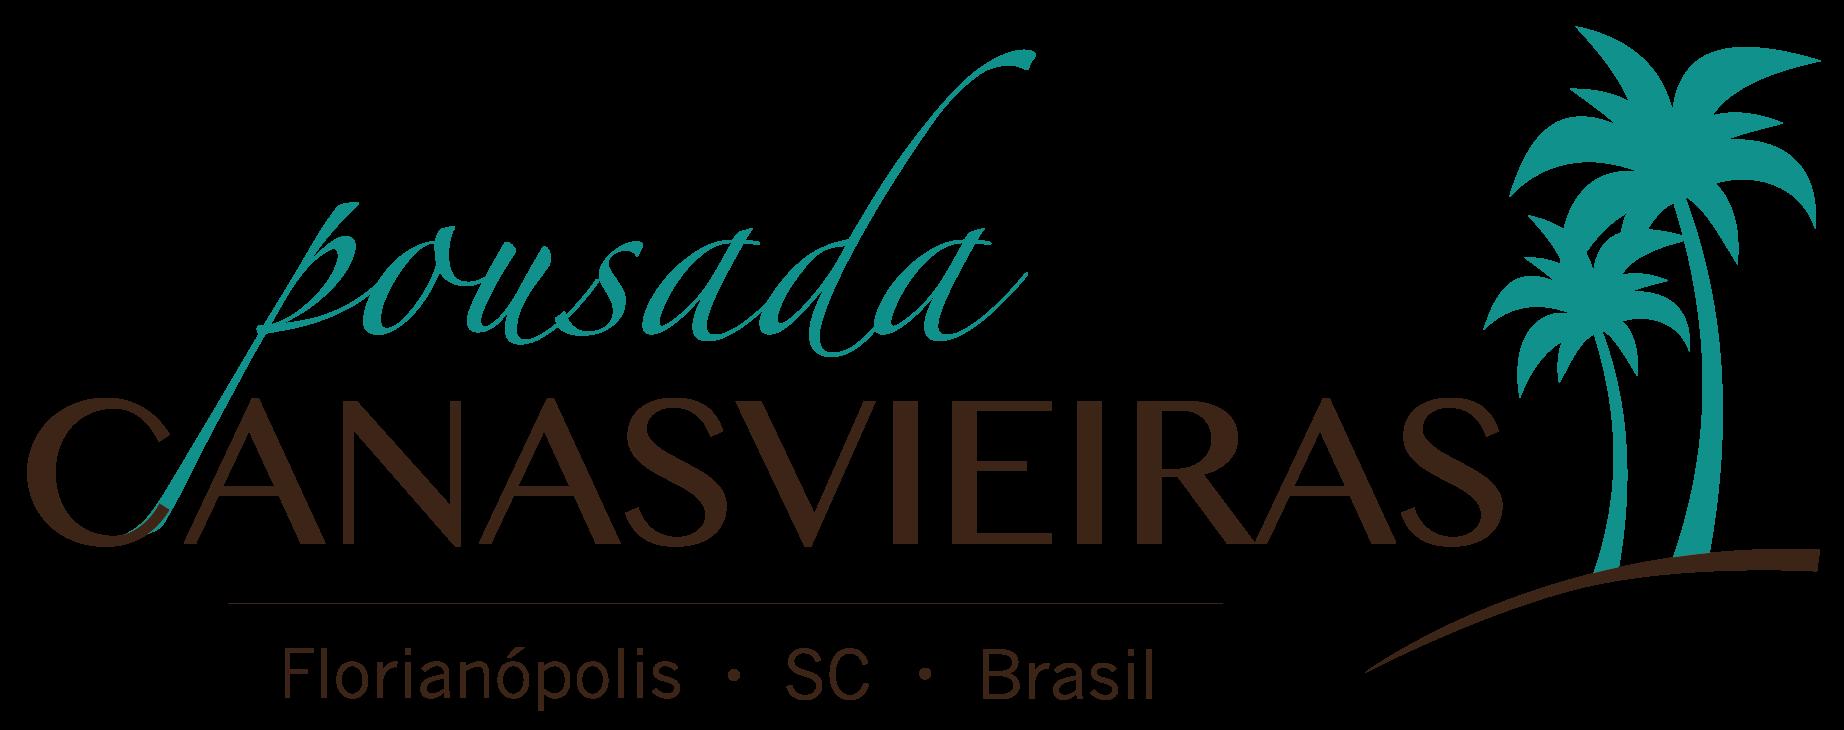 Pousada Canasvieiras – Florianópolis – SC